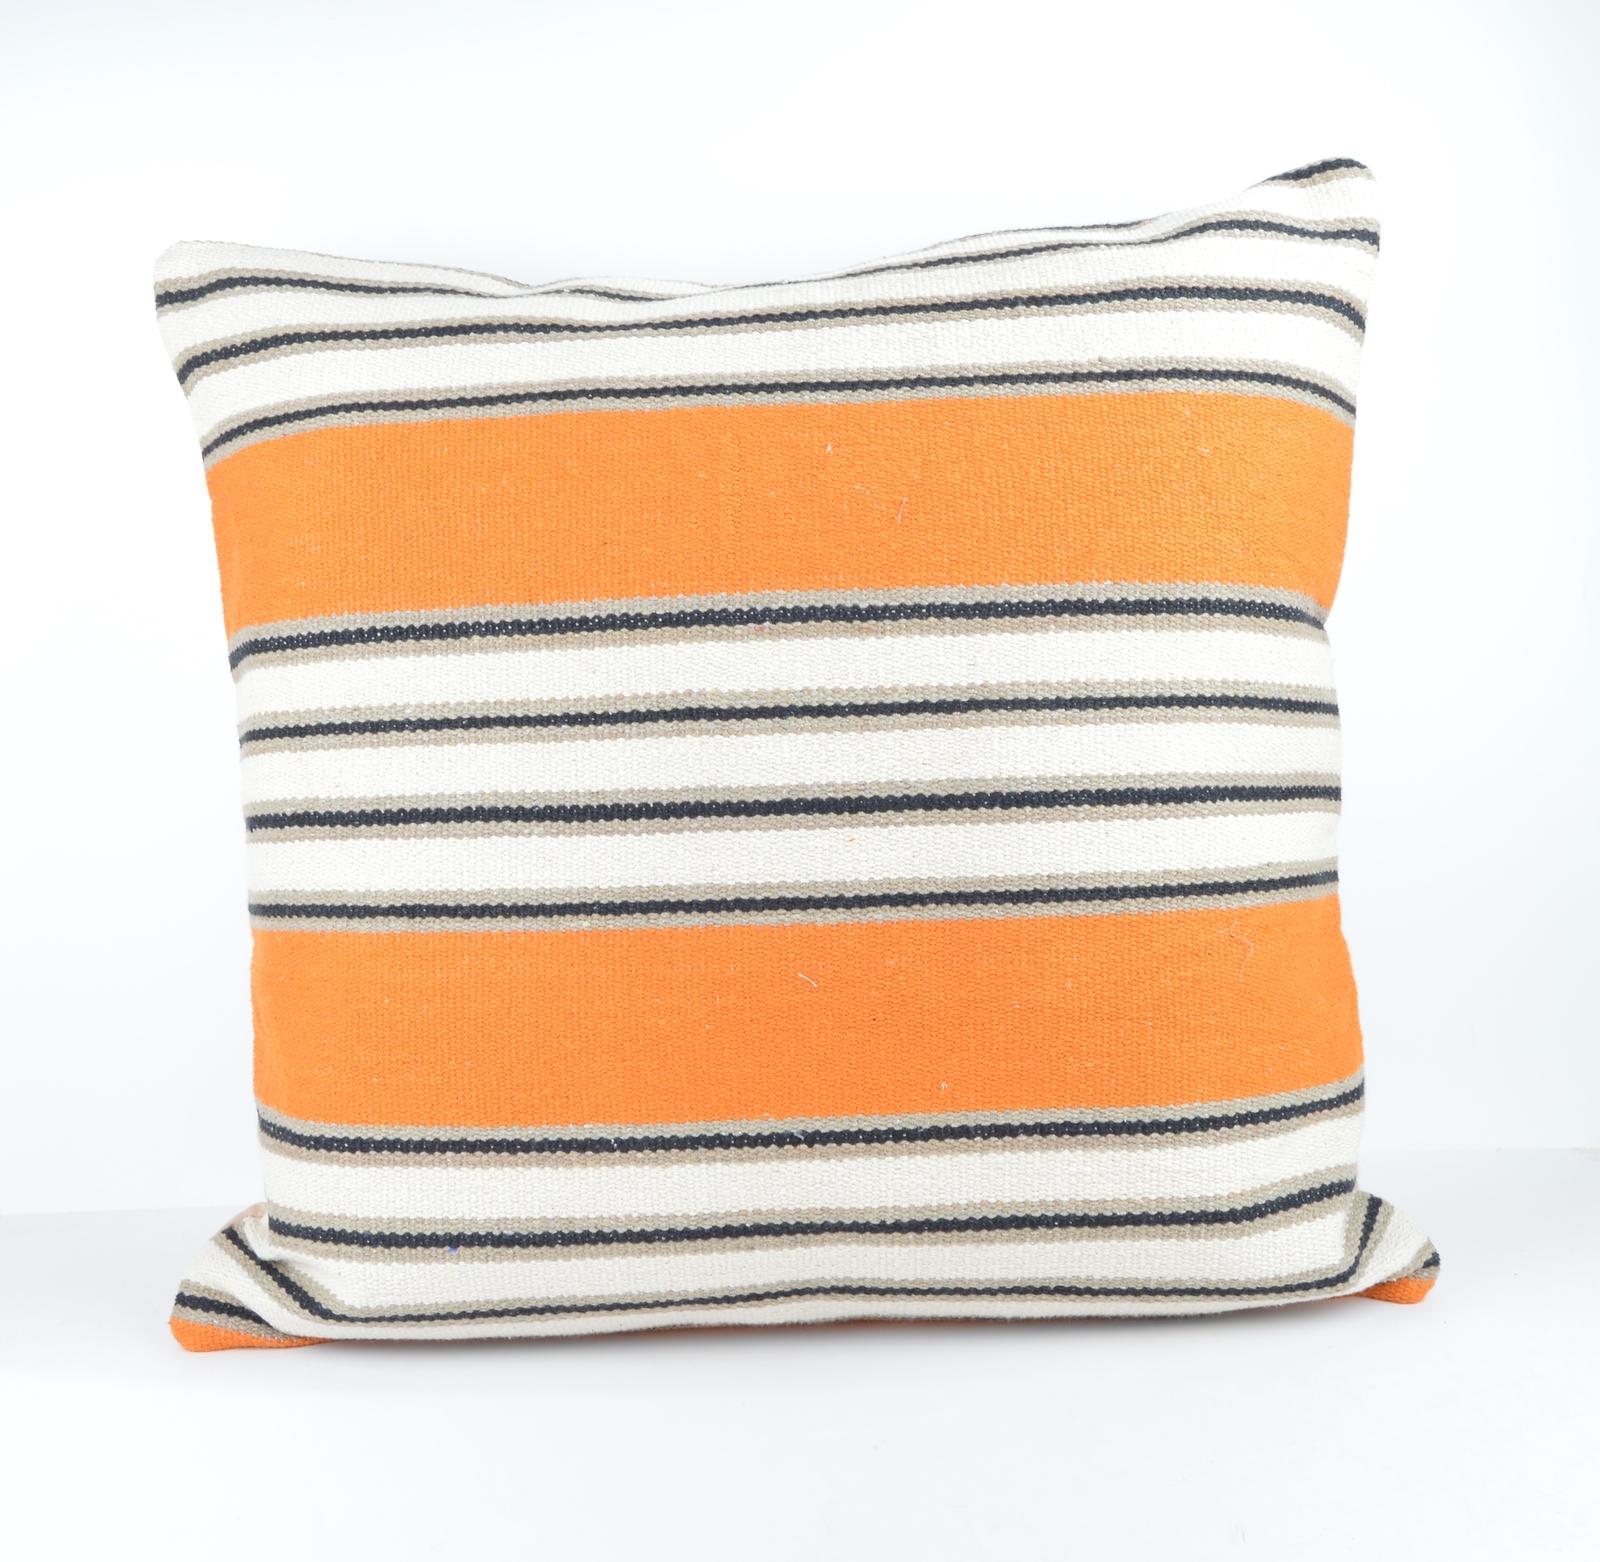 24x24 large kilim pillow big pillow decorative pillow cover large cushion case - Decorative ...